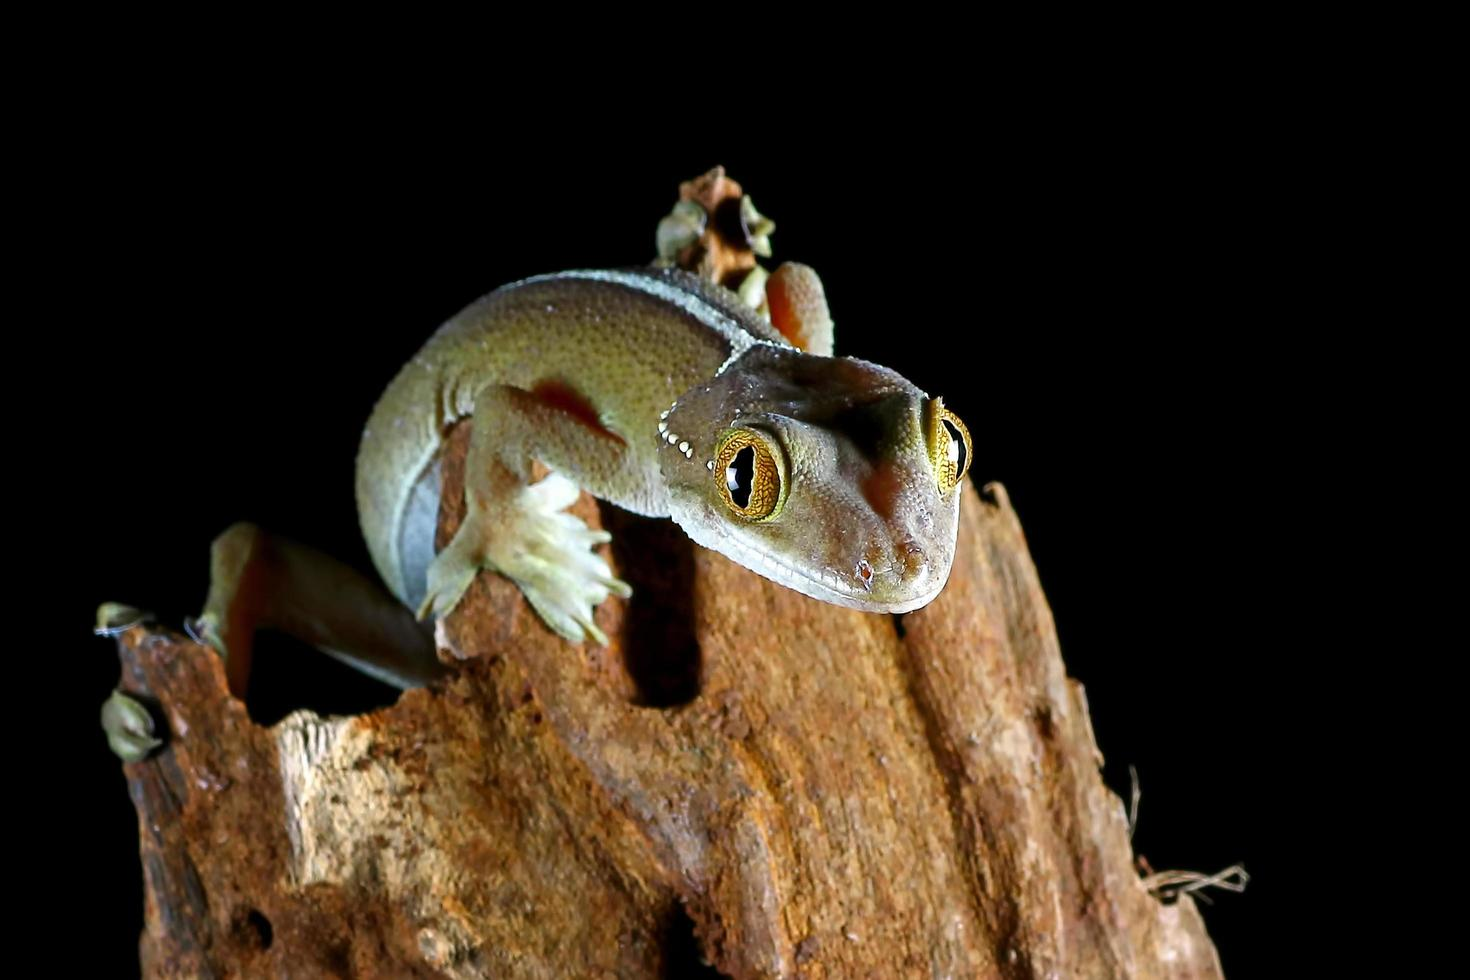 vit linje gecko ödla foto